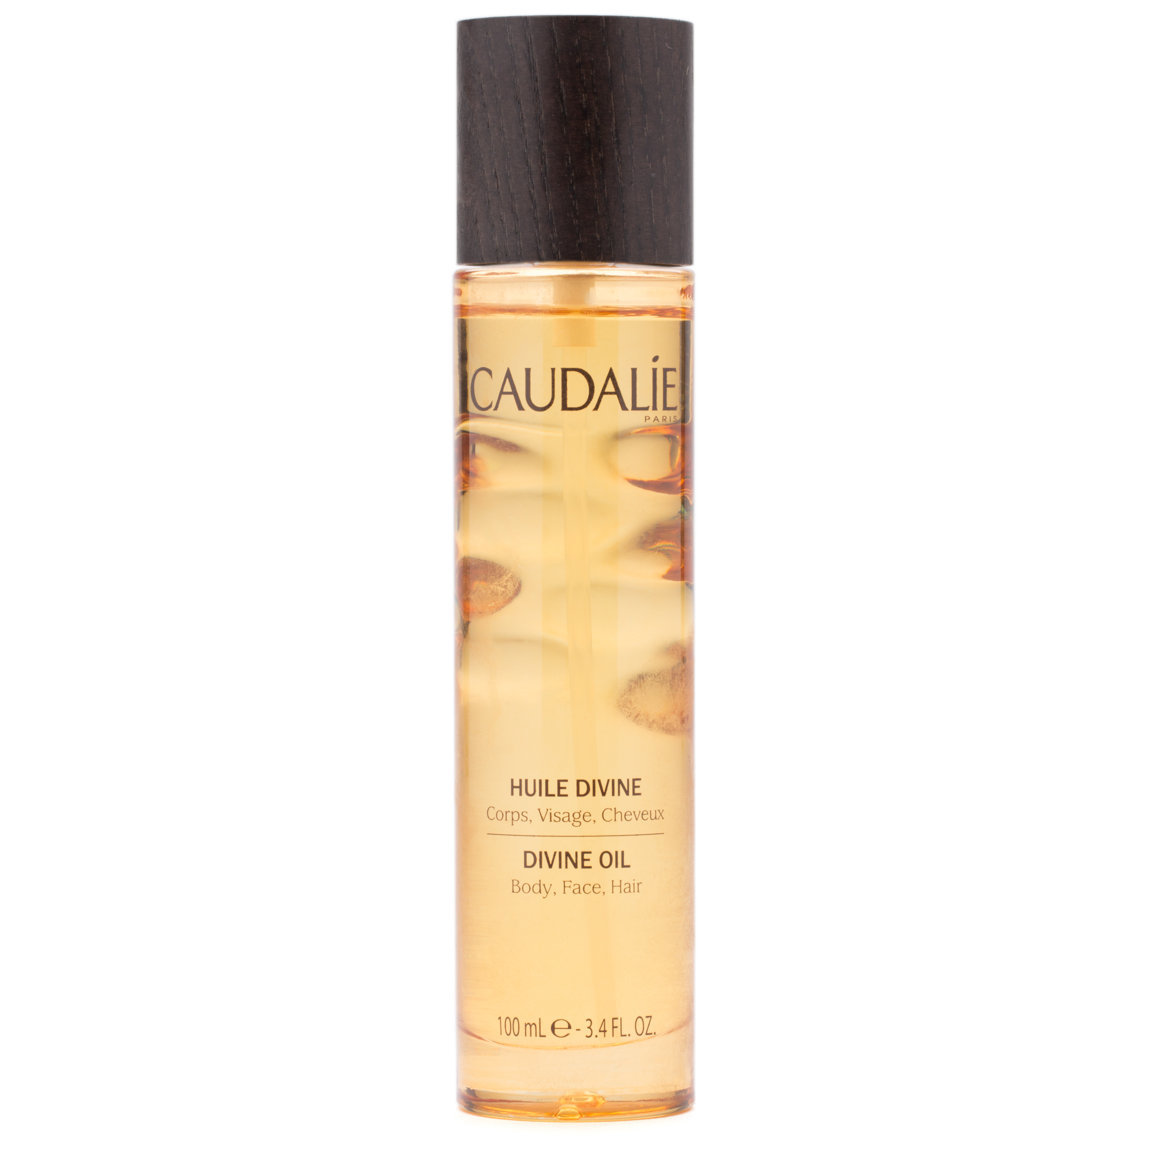 Caudalie Divine Oil 100 ml product swatch.